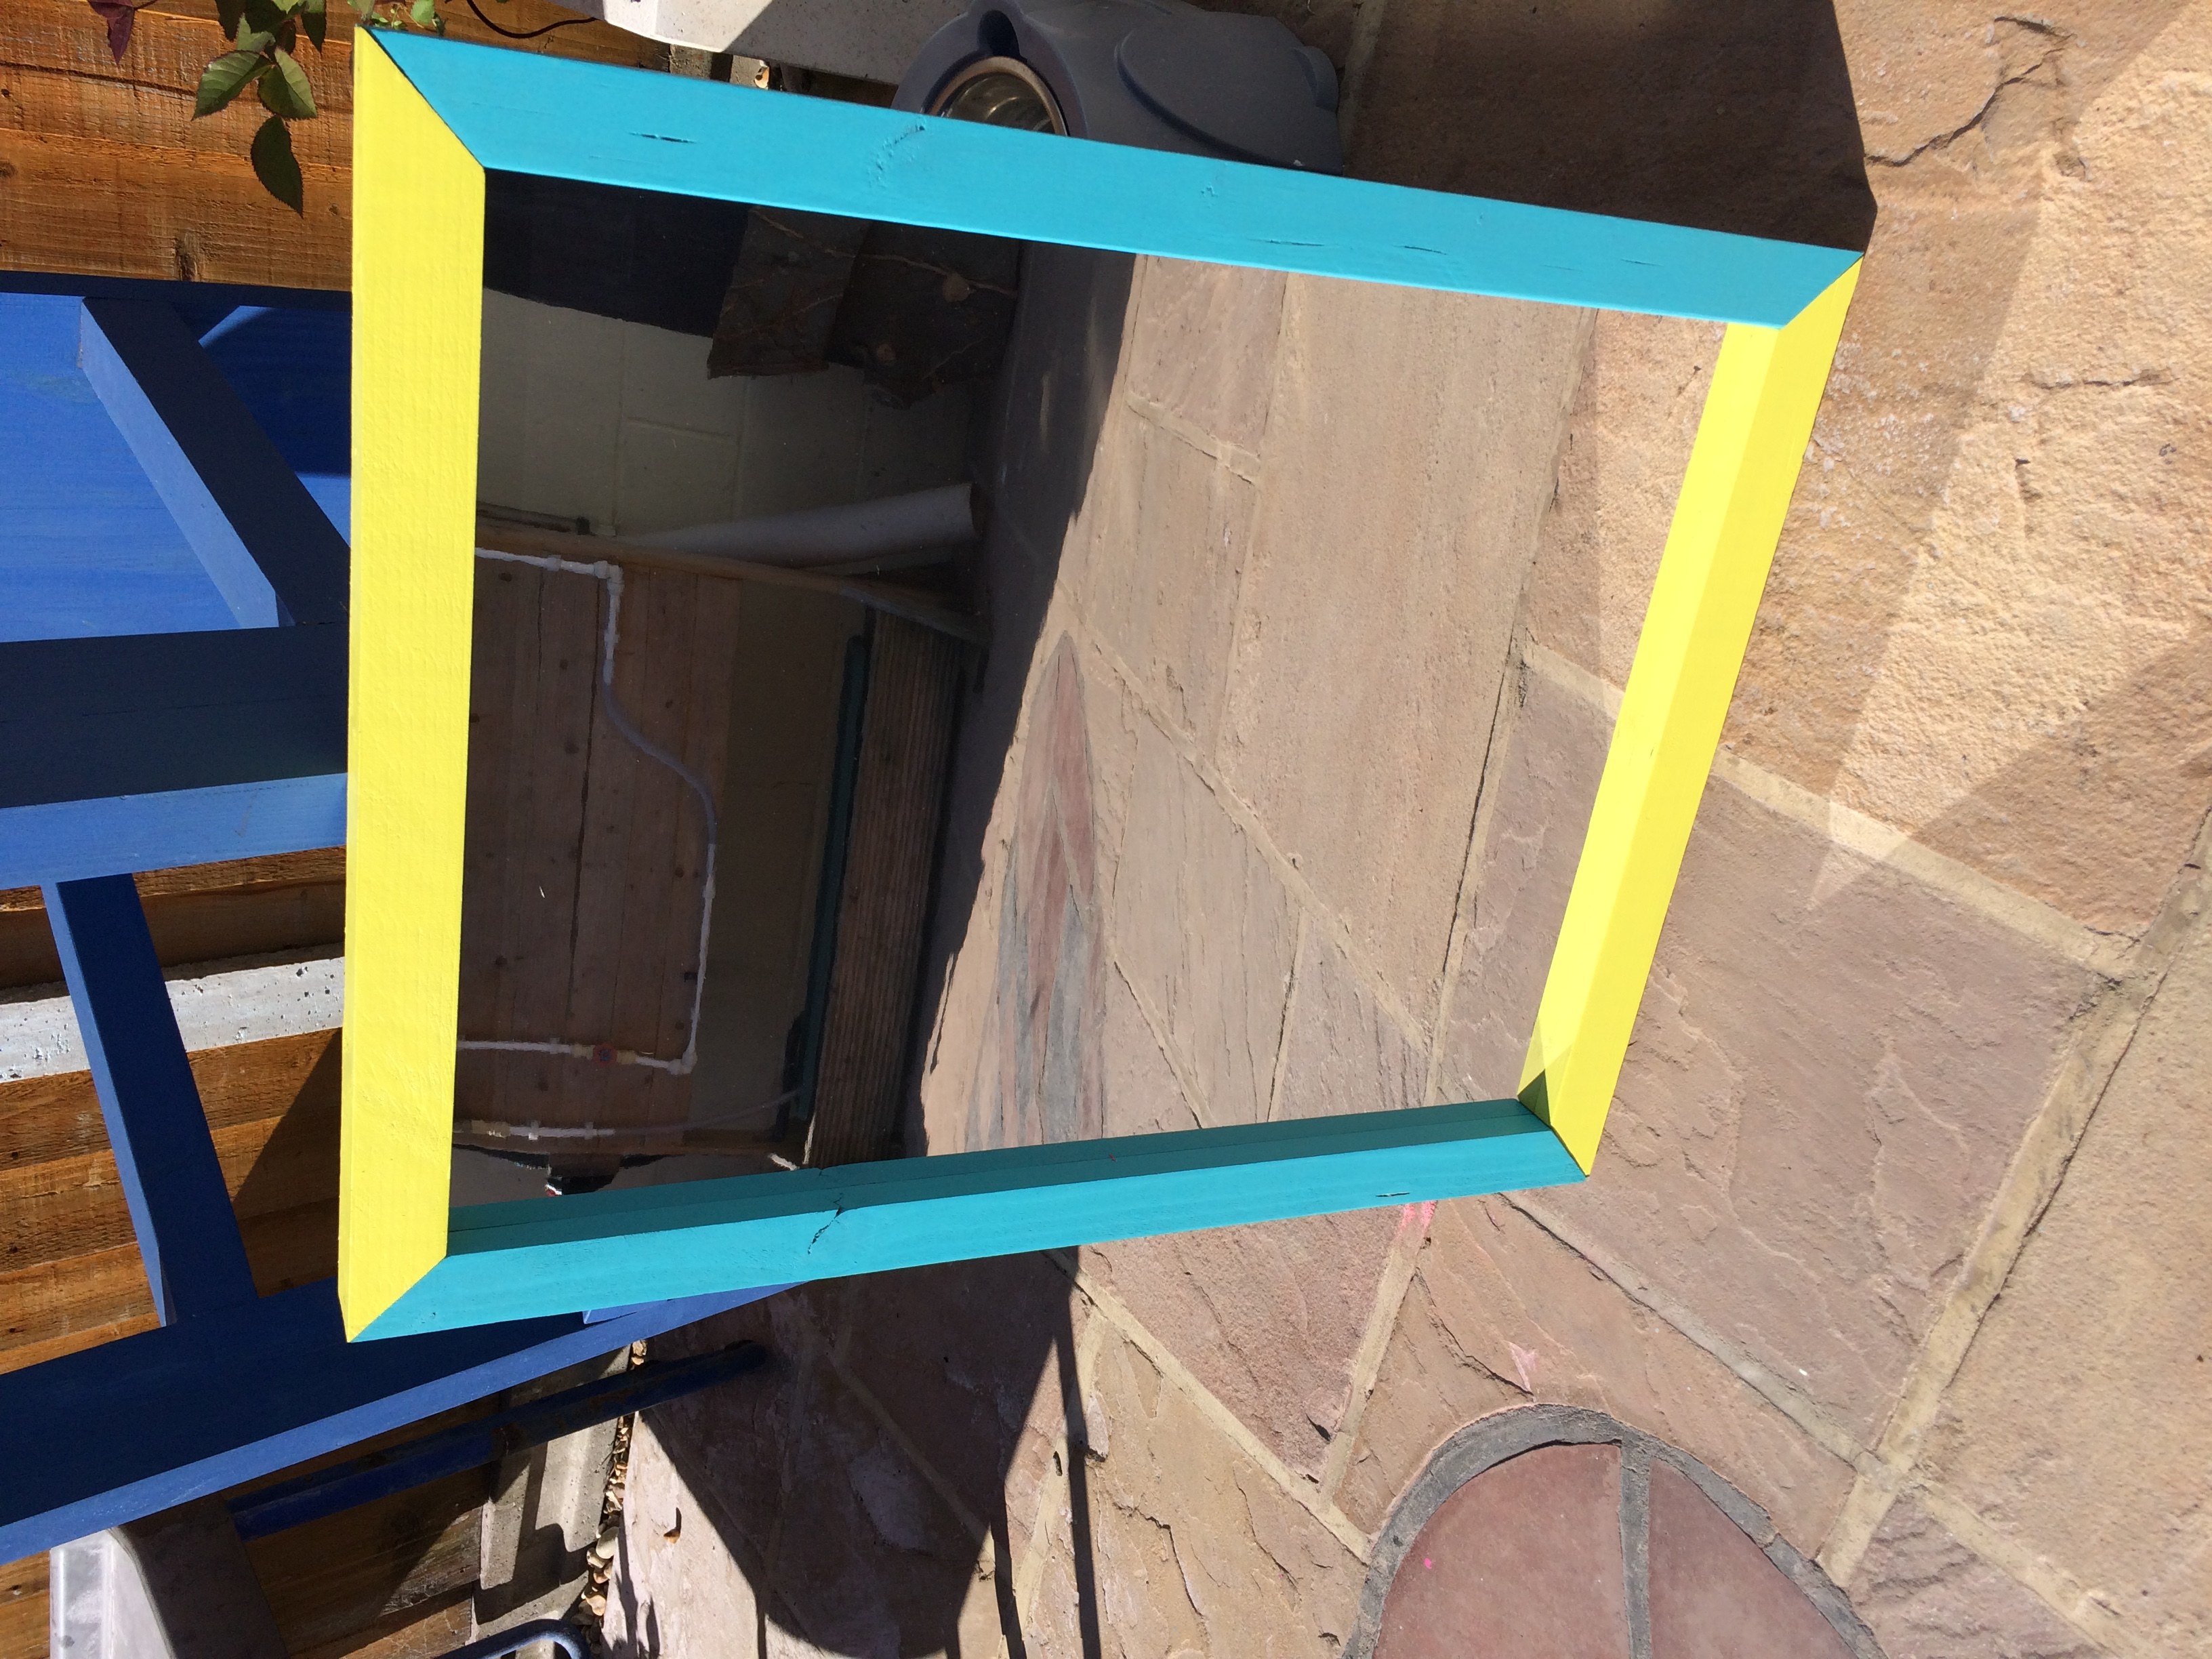 Mirror beach blue and yellow